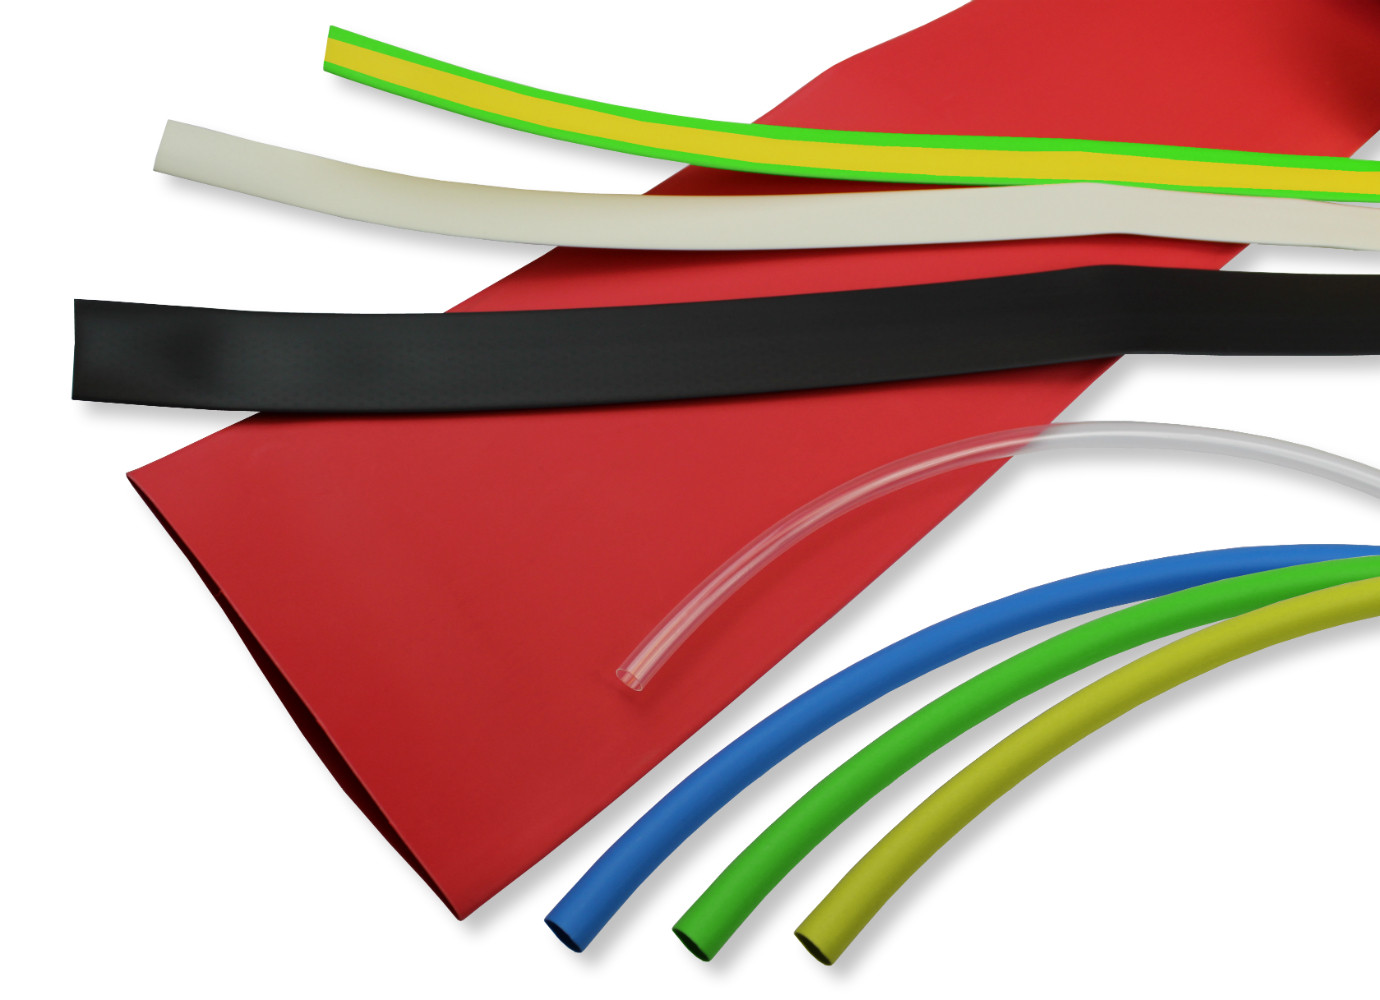 Heat Shrink Tubing 3:1 Ratio HSP3 size 1.5mm I.D / 0.5mm I.D Black